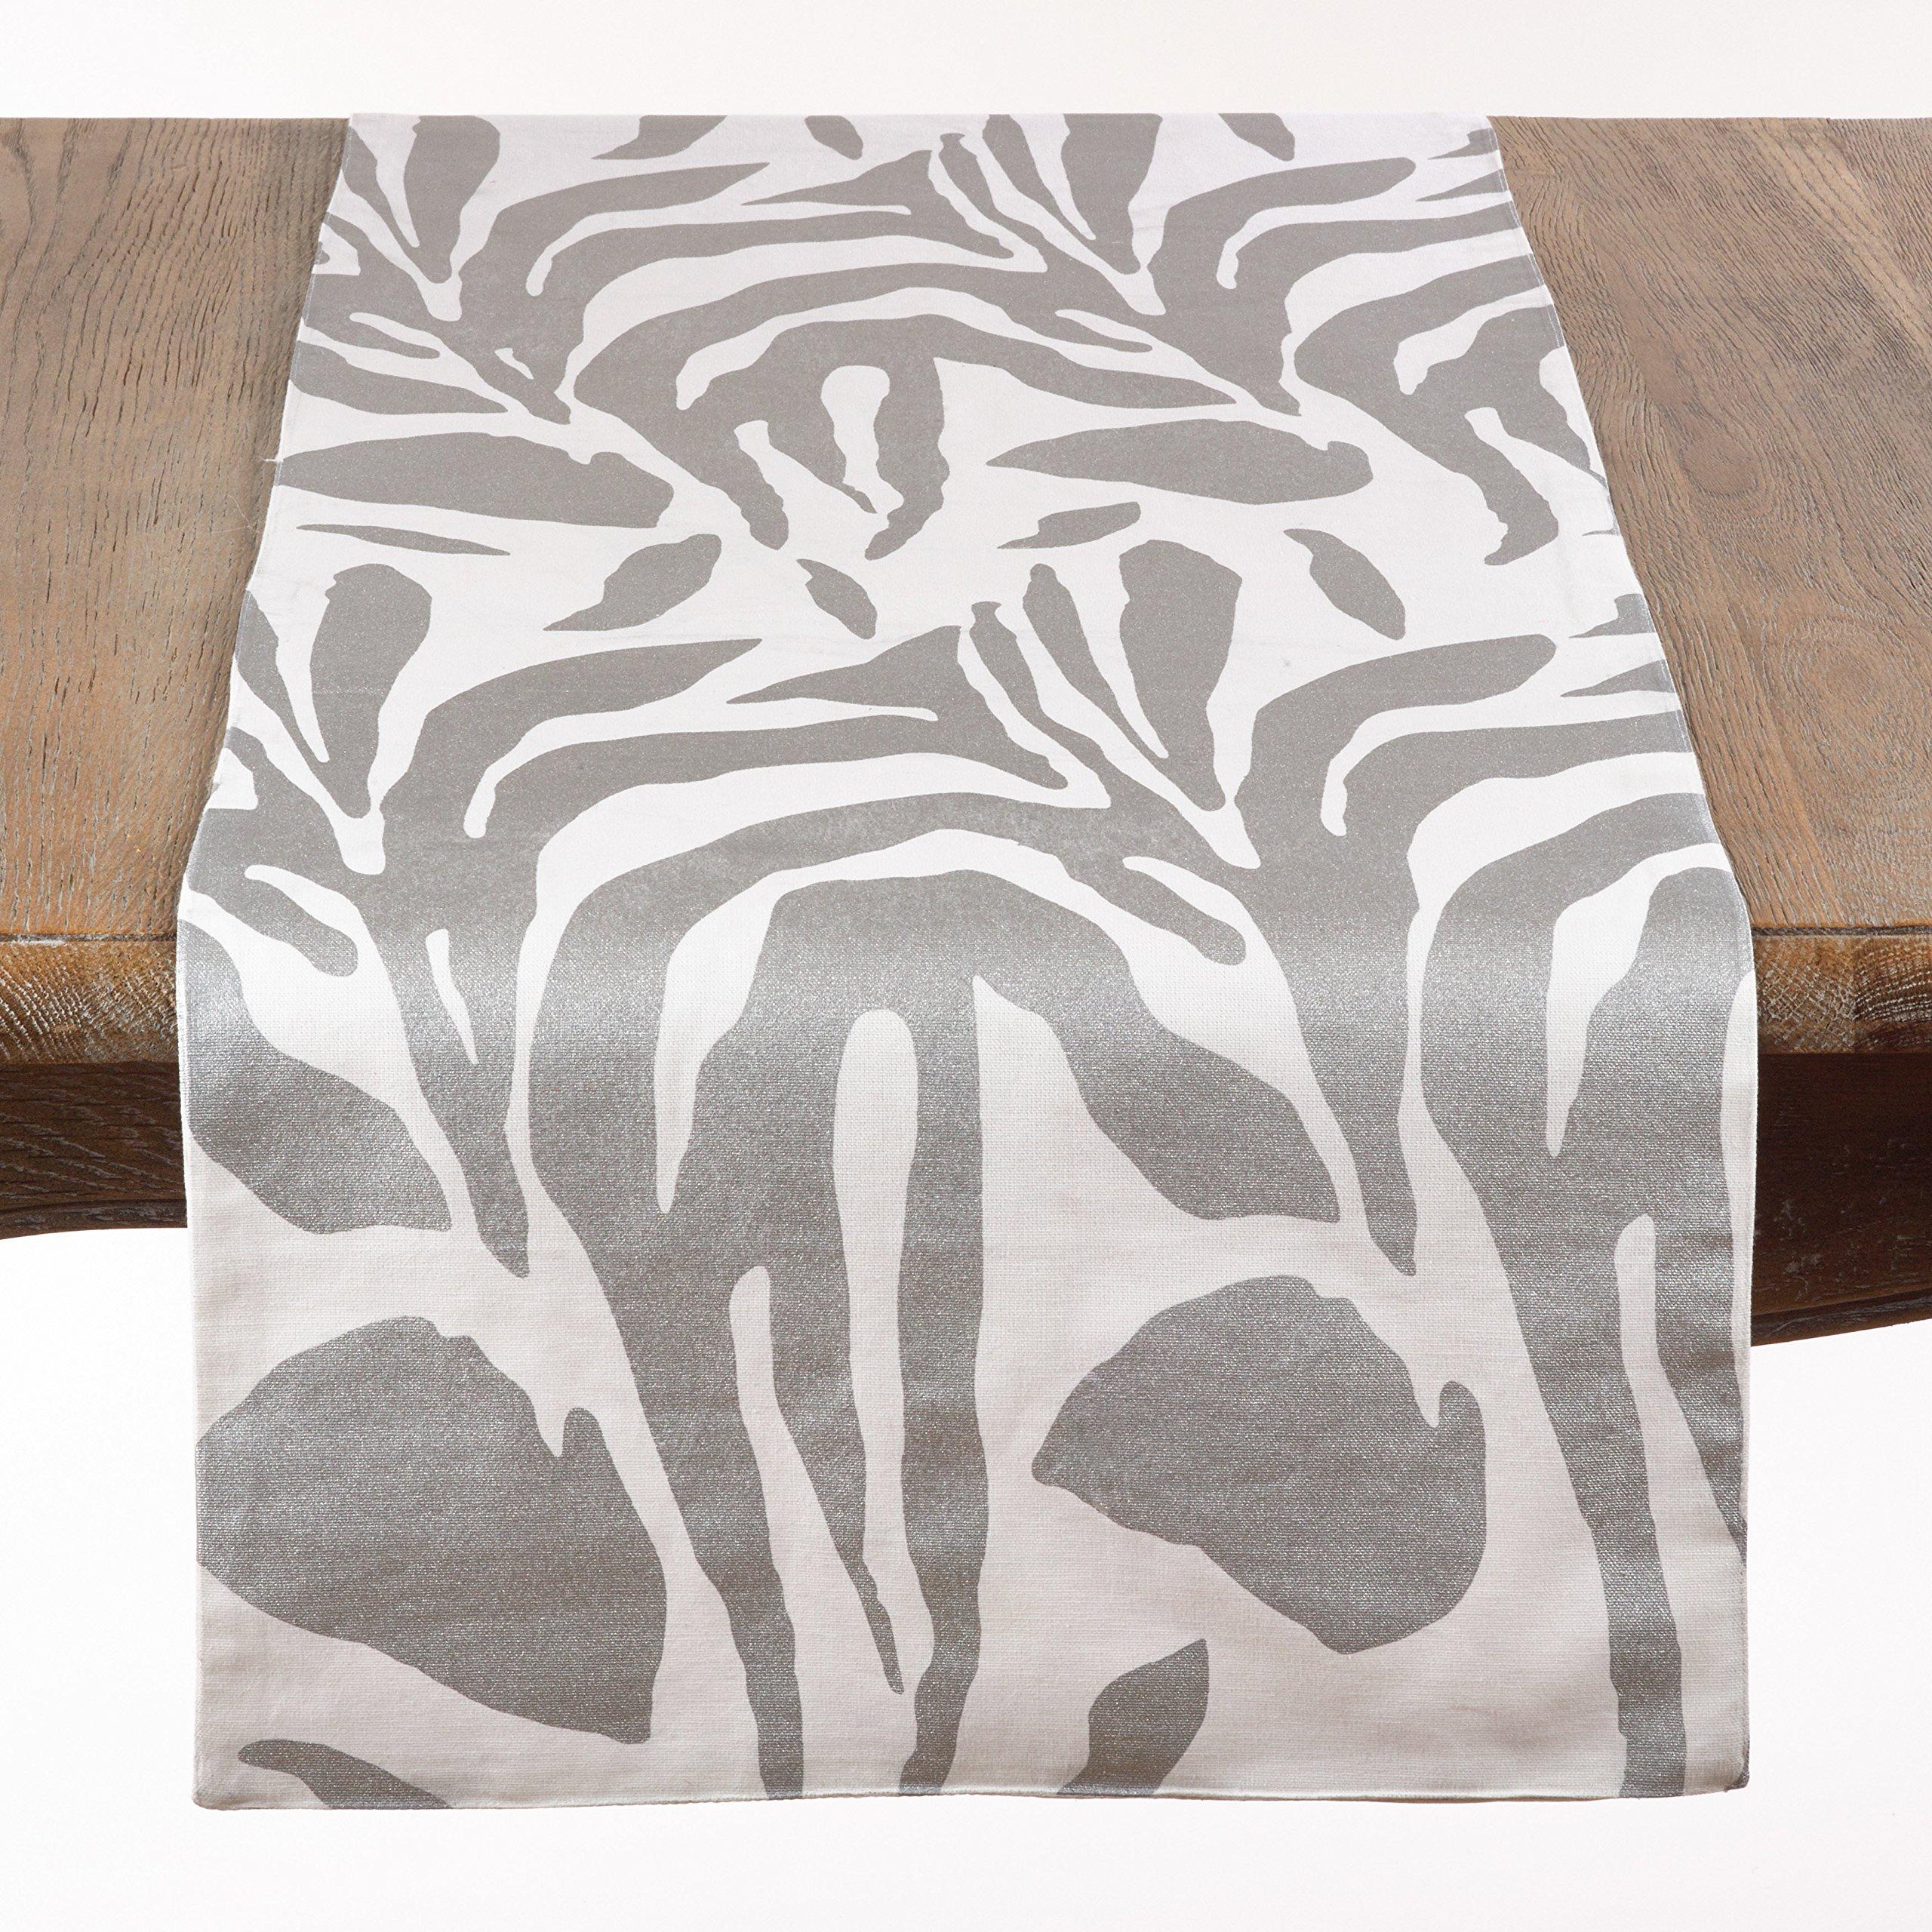 Malawi Animal Print Cotton Table Runner, 16''x72'' (Silver)